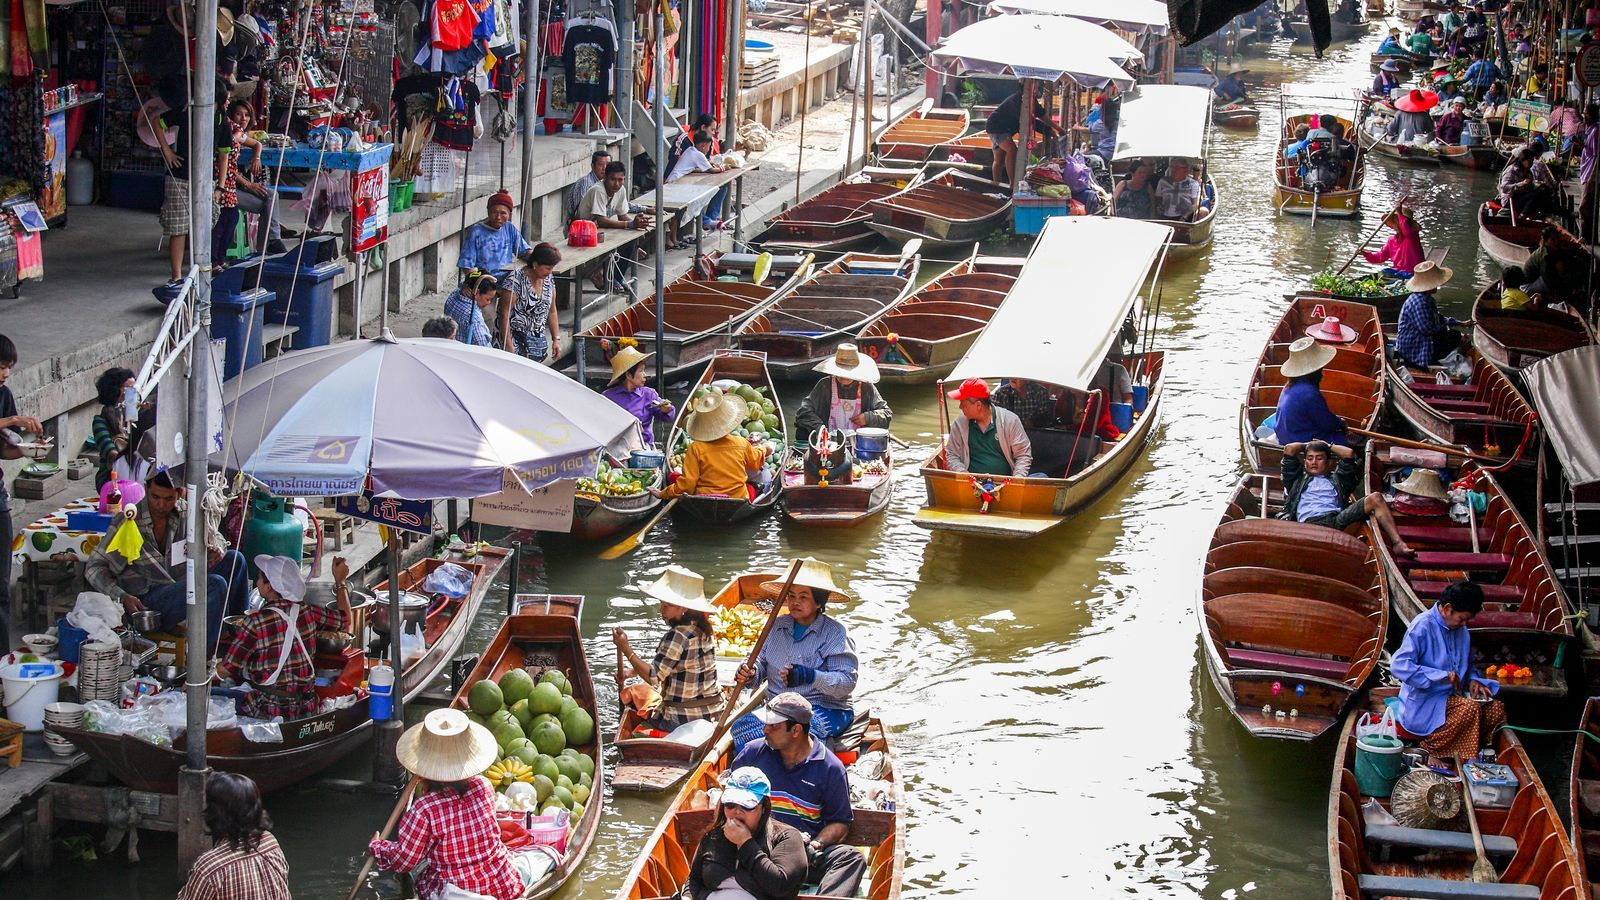 El mercat flotant de Damnoen Saduak, a prop de Bangkok